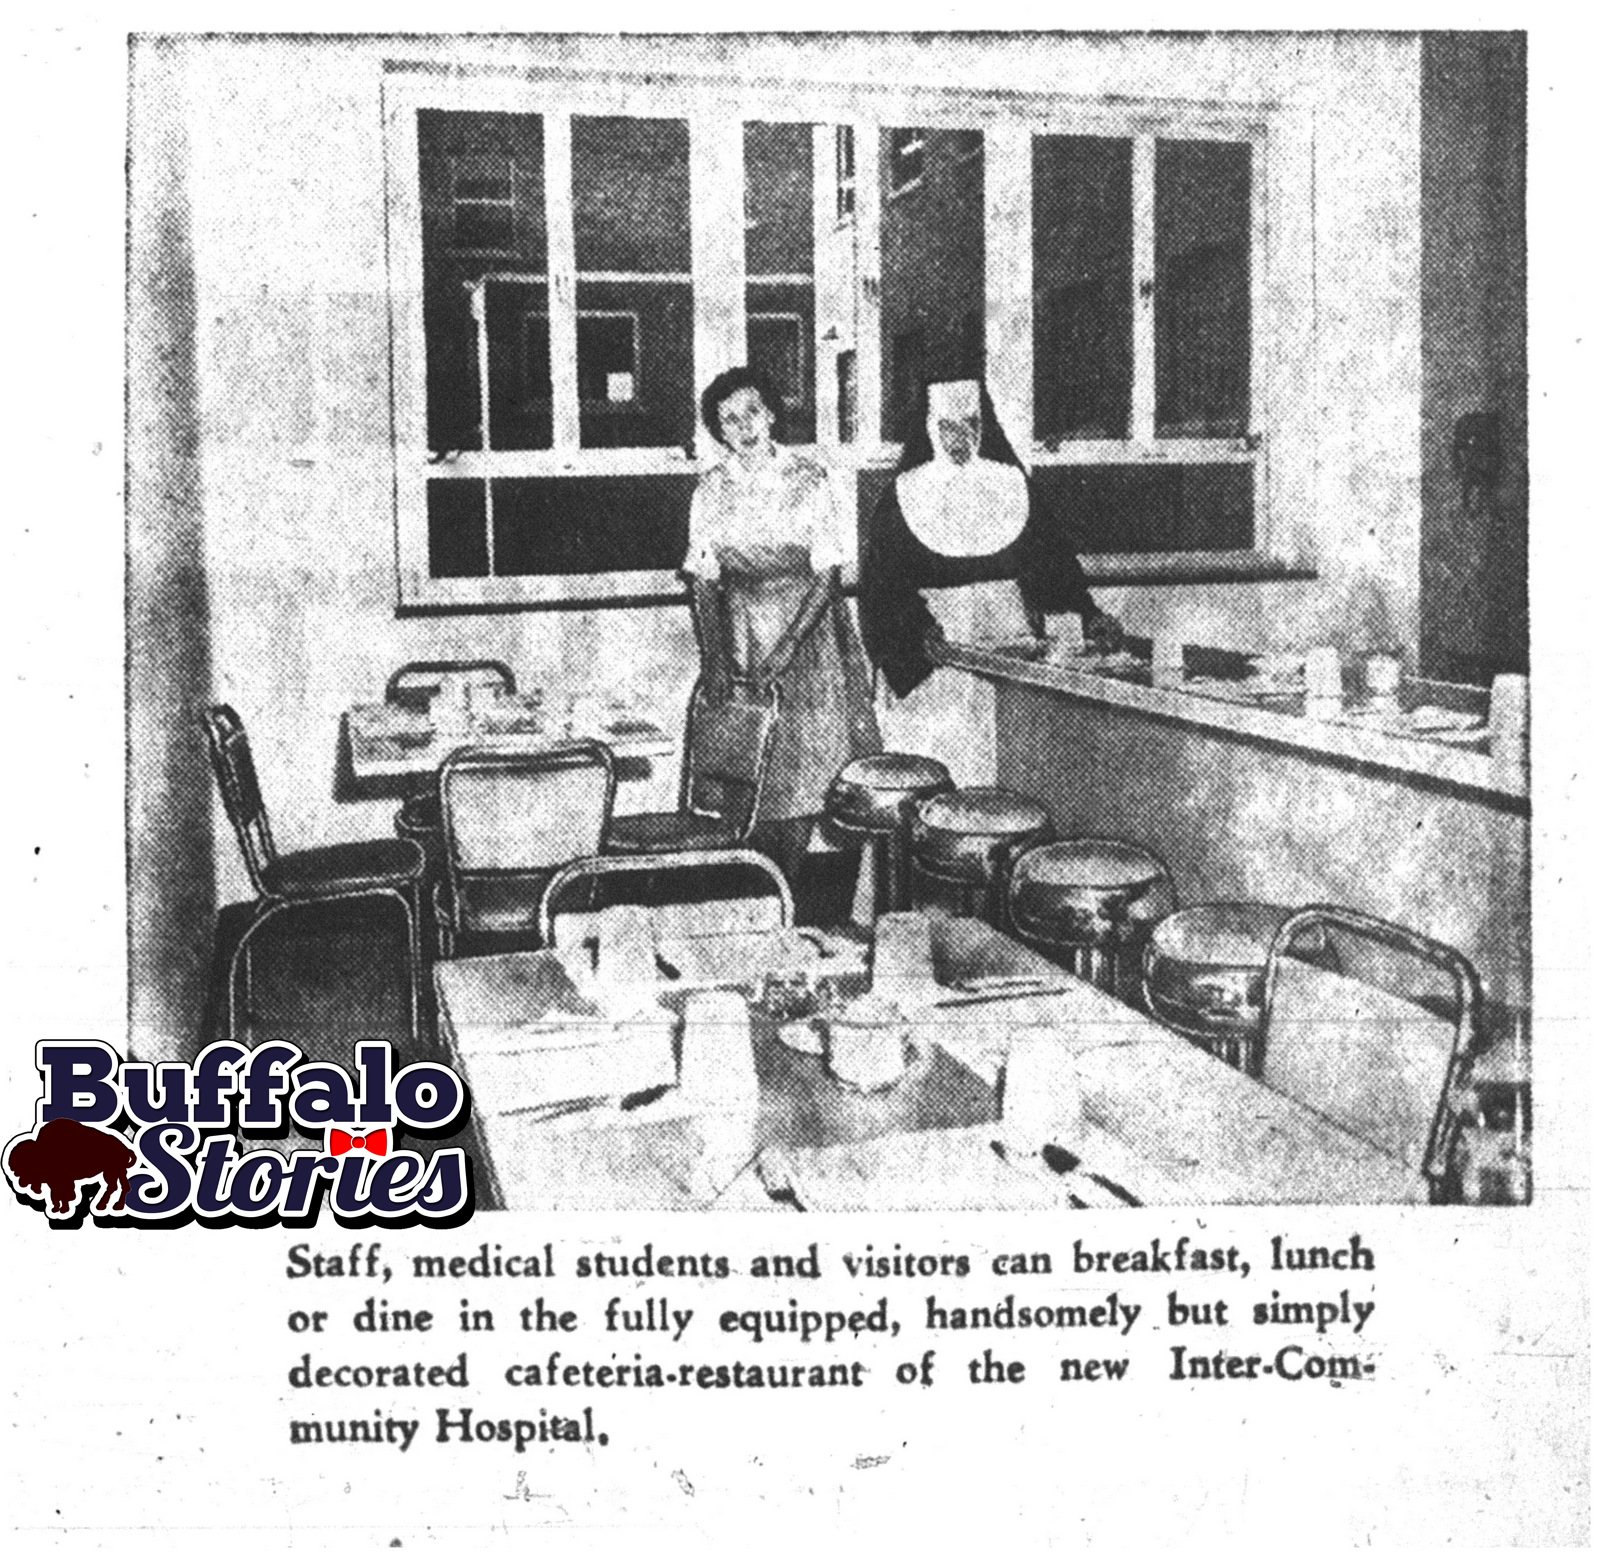 Cheektowaga – Buffalo Stories Archives & Blog